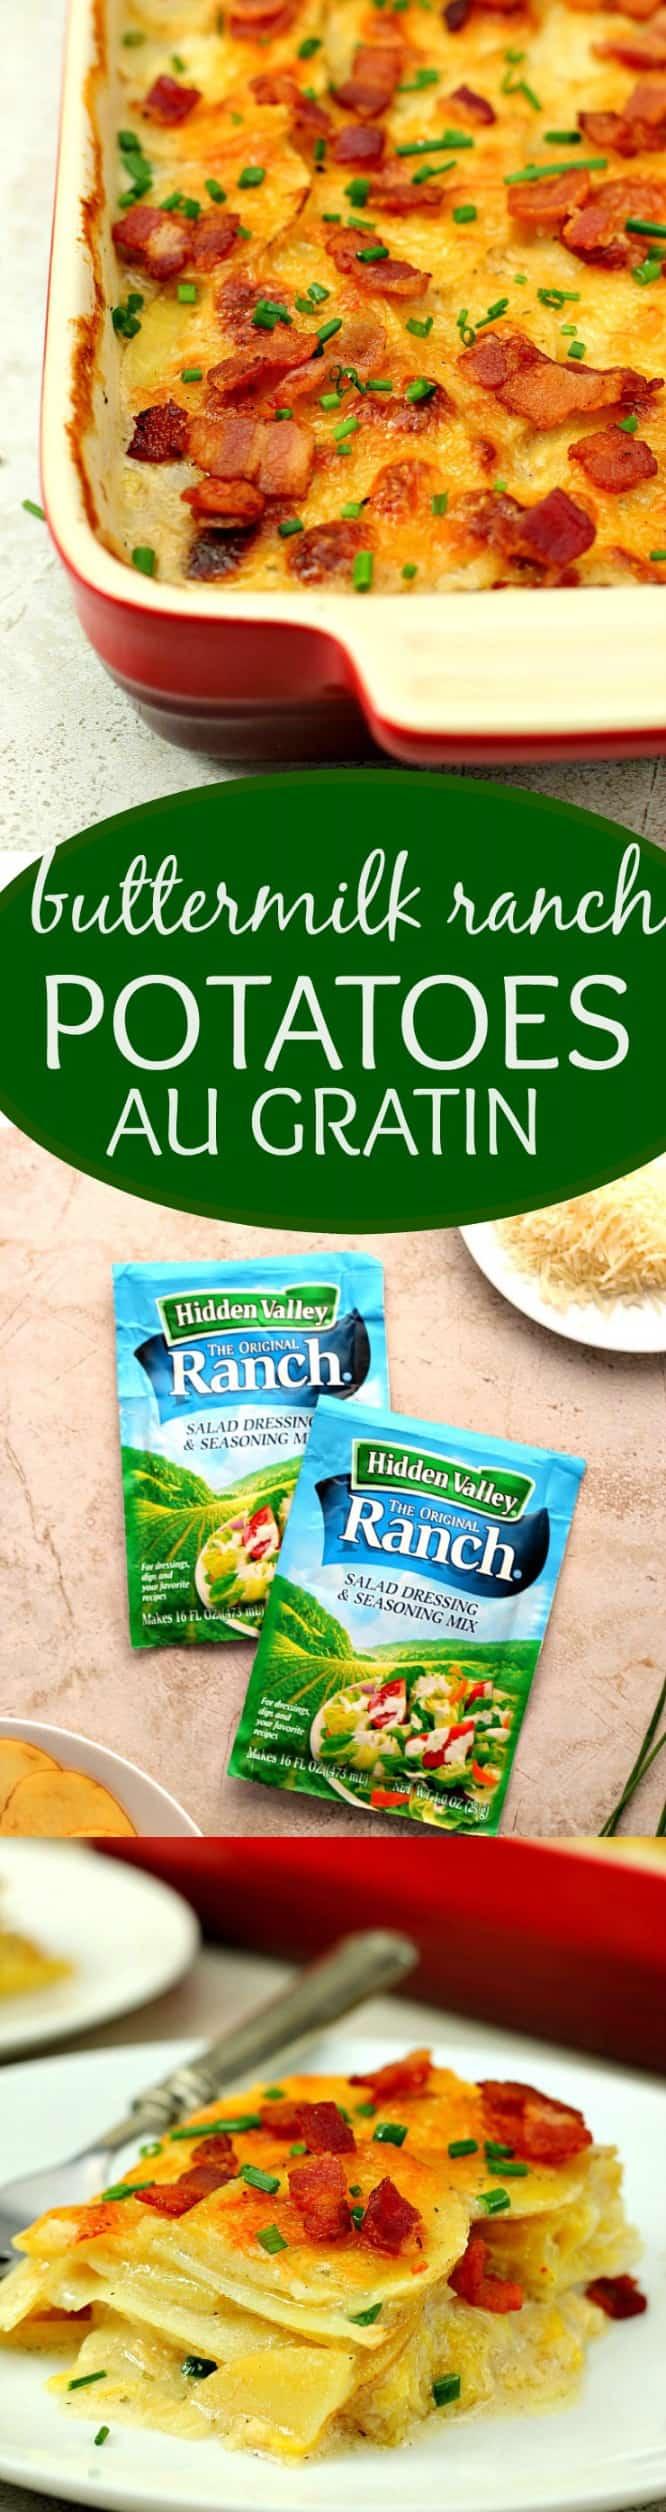 buttermilk ranch potatoes au gratin long Buttermilk Ranch Potato Gratin